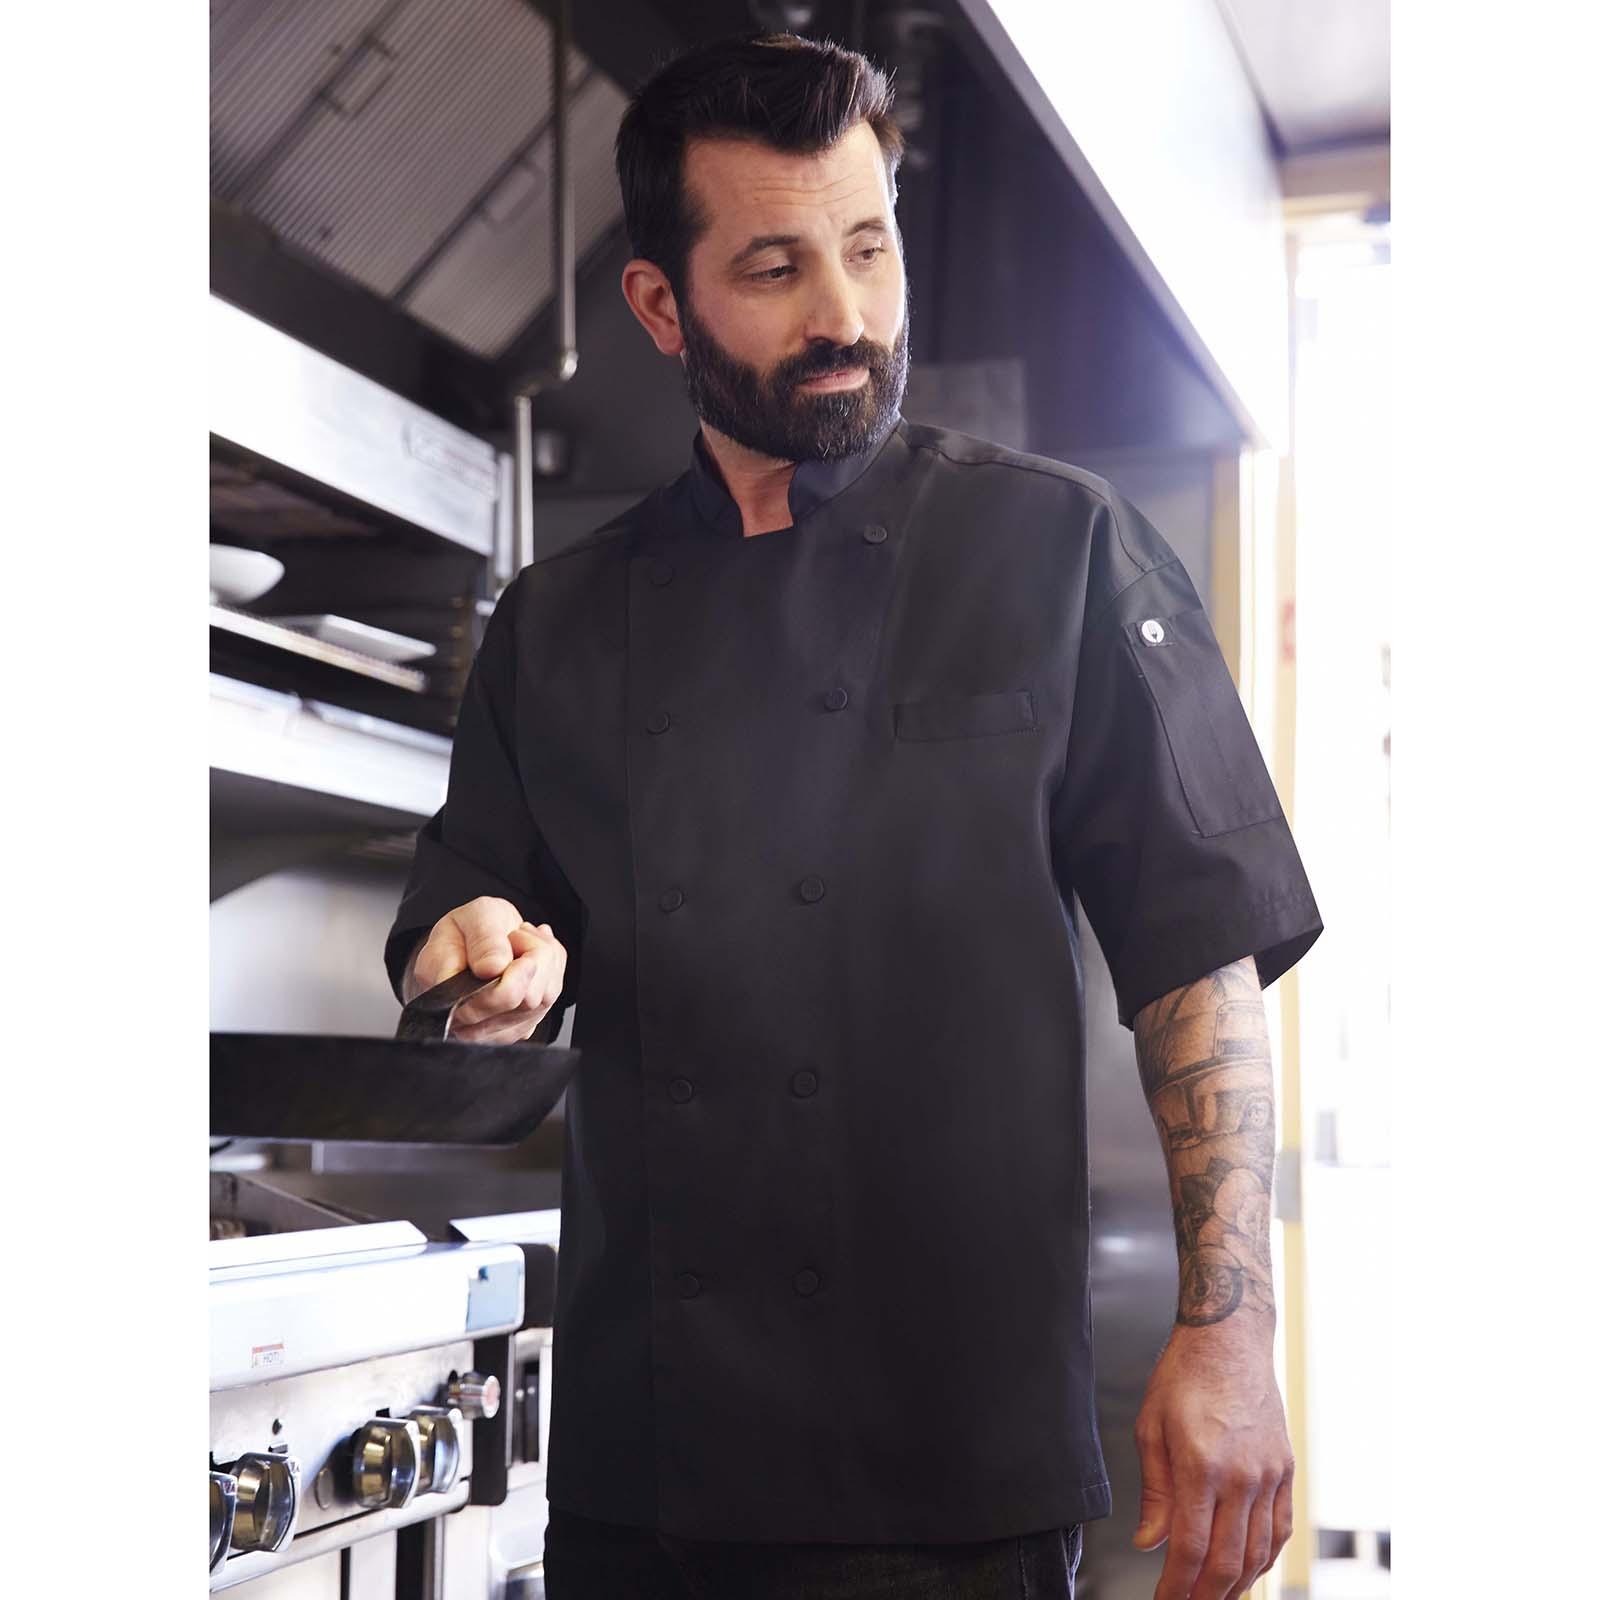 Chef Works EWCVBLK2XL chef's coat